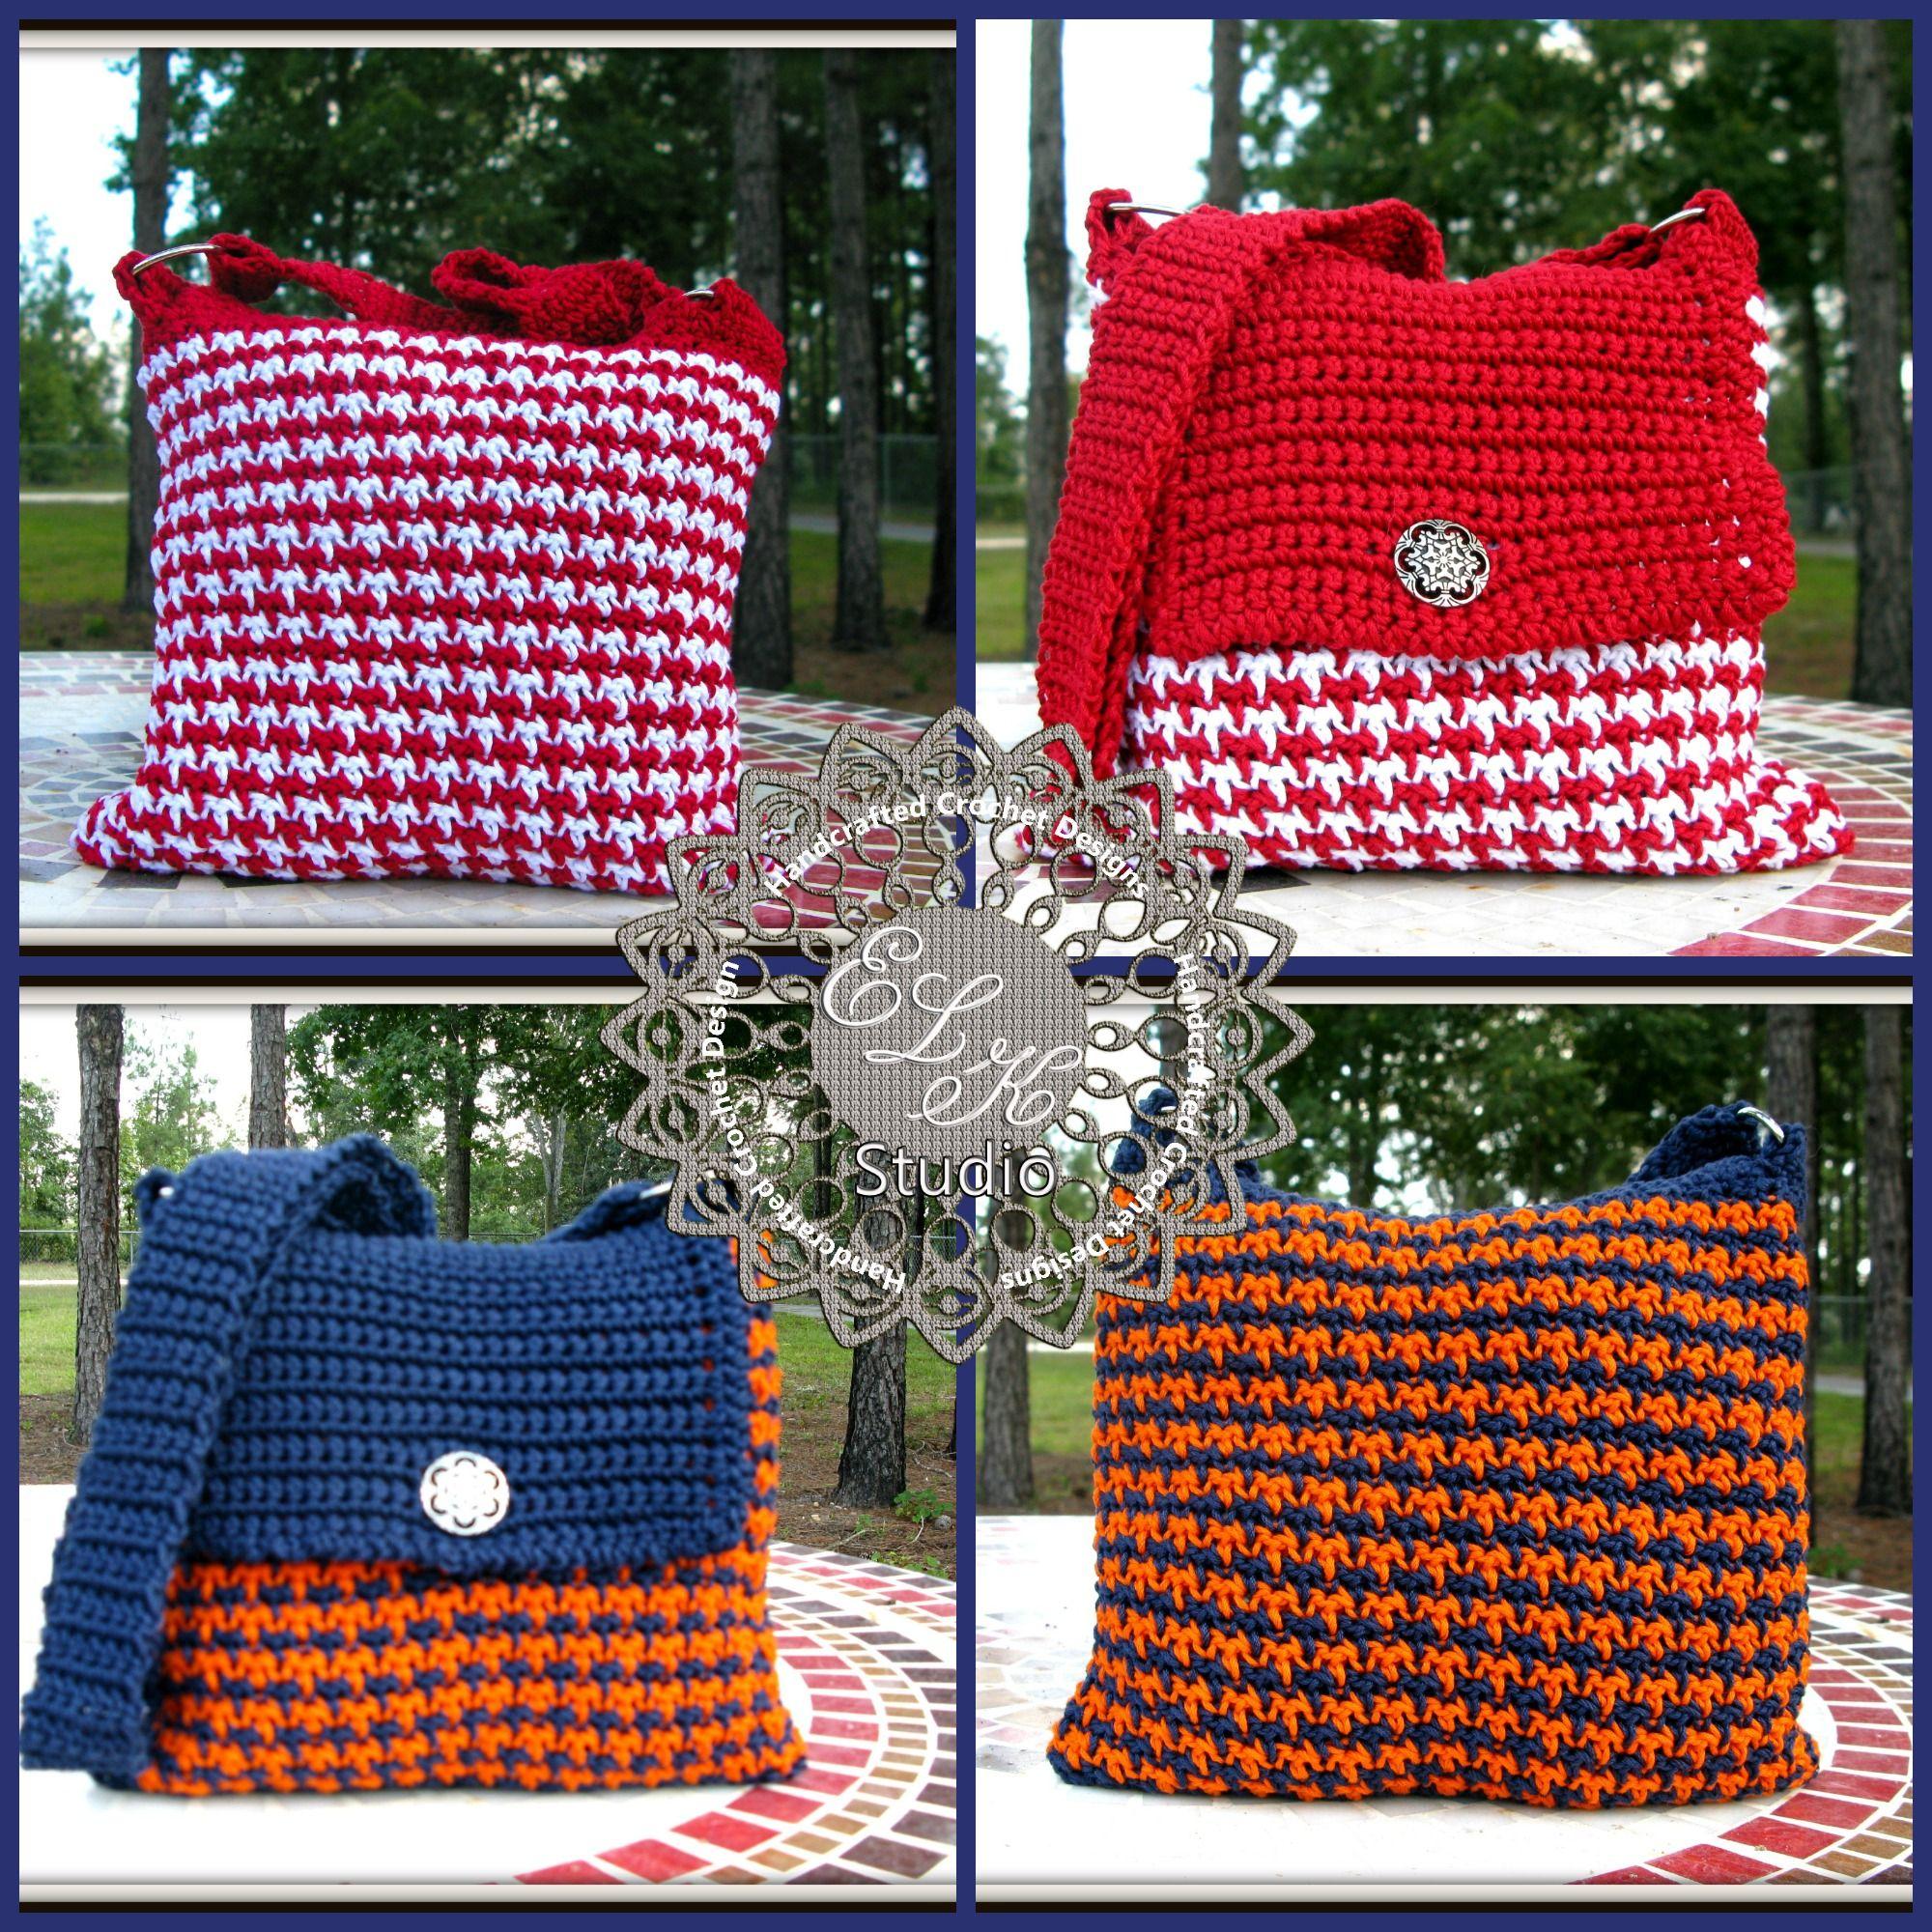 Auburn vs Alabama Crochet Style   Houndstooth, Elk and Crochet